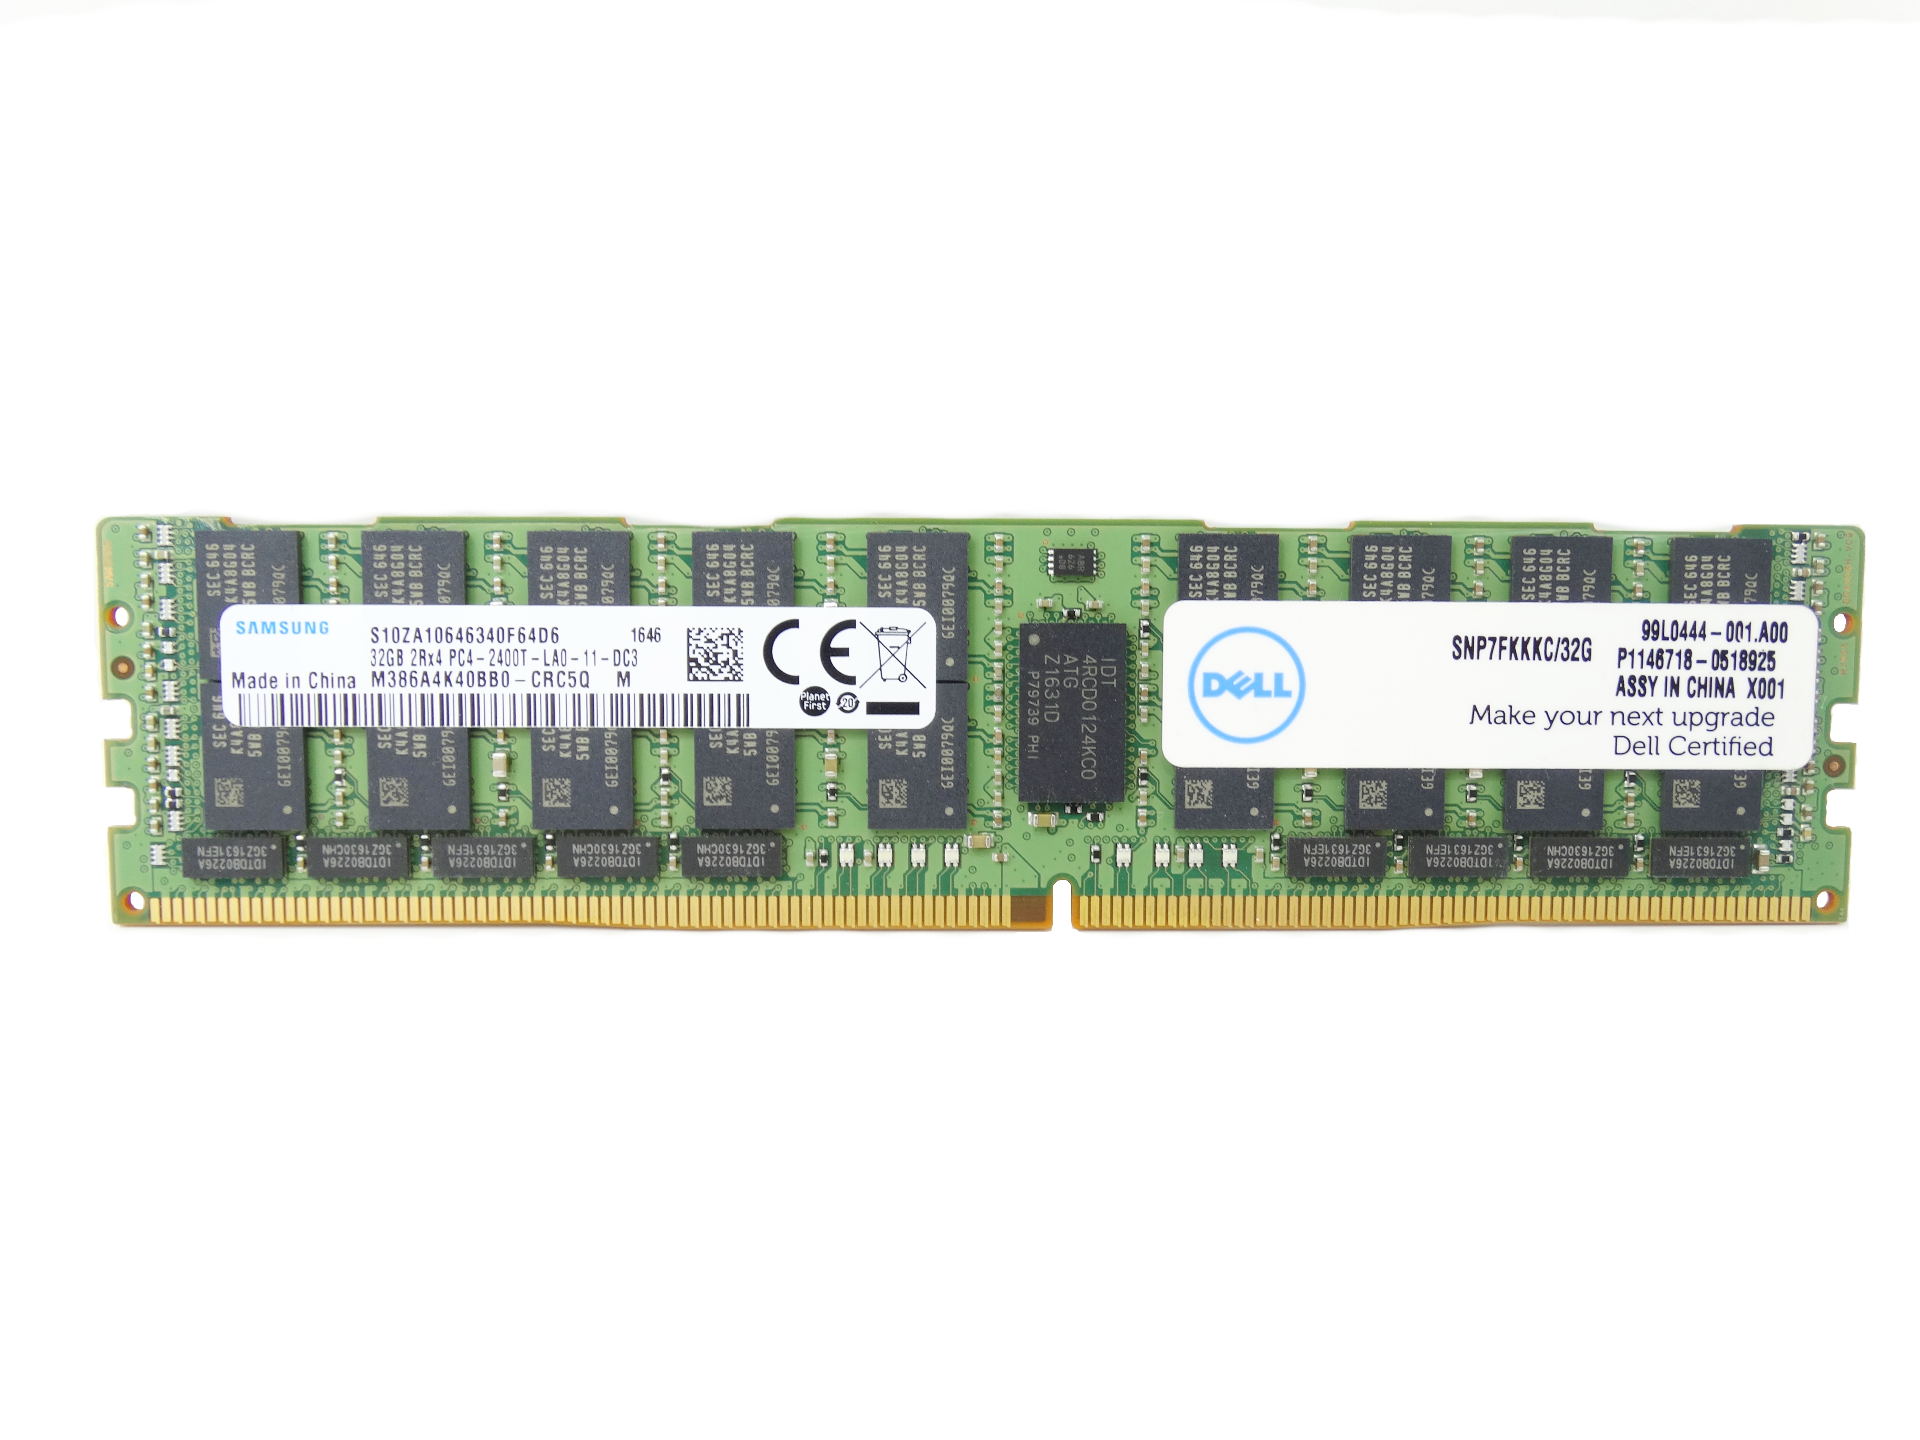 Dell 32GB 2Rx4 PC4-19200 DDR4-2400MHz ECC Regulated RAM Memory (SNP7FKKKC/32G)